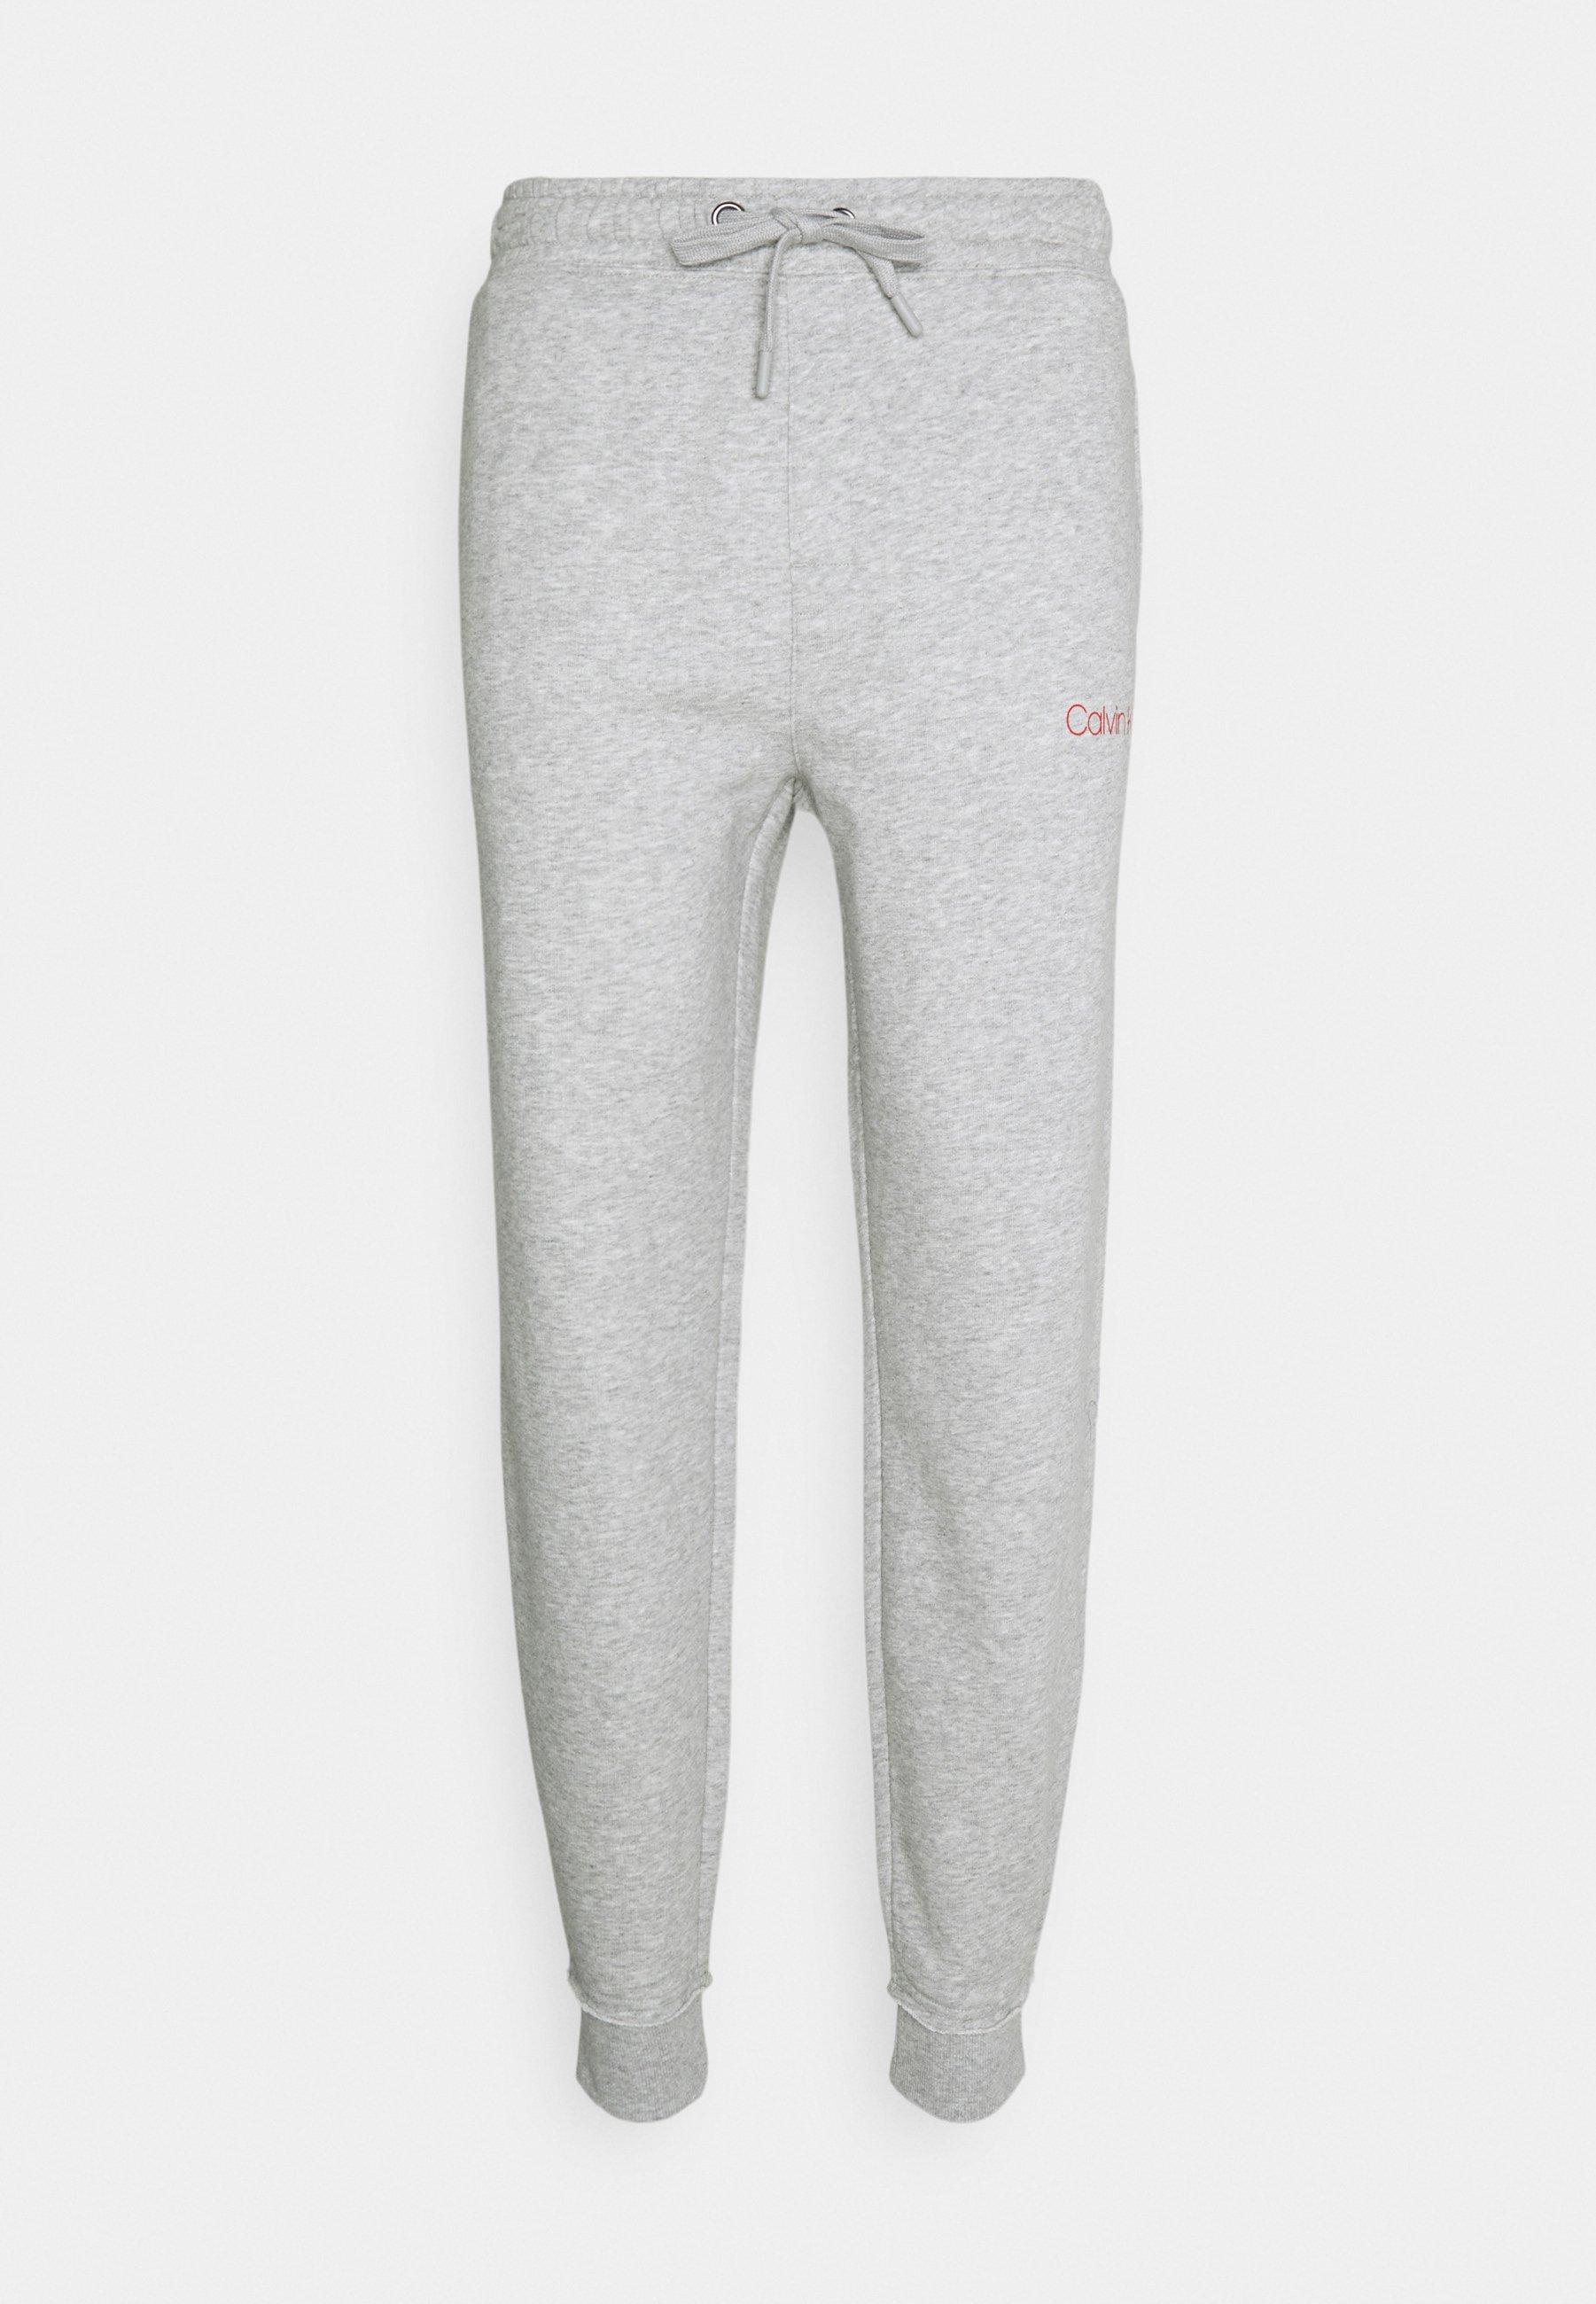 Homme RAW EDGE LOUNGE JOGGER - Bas de pyjama